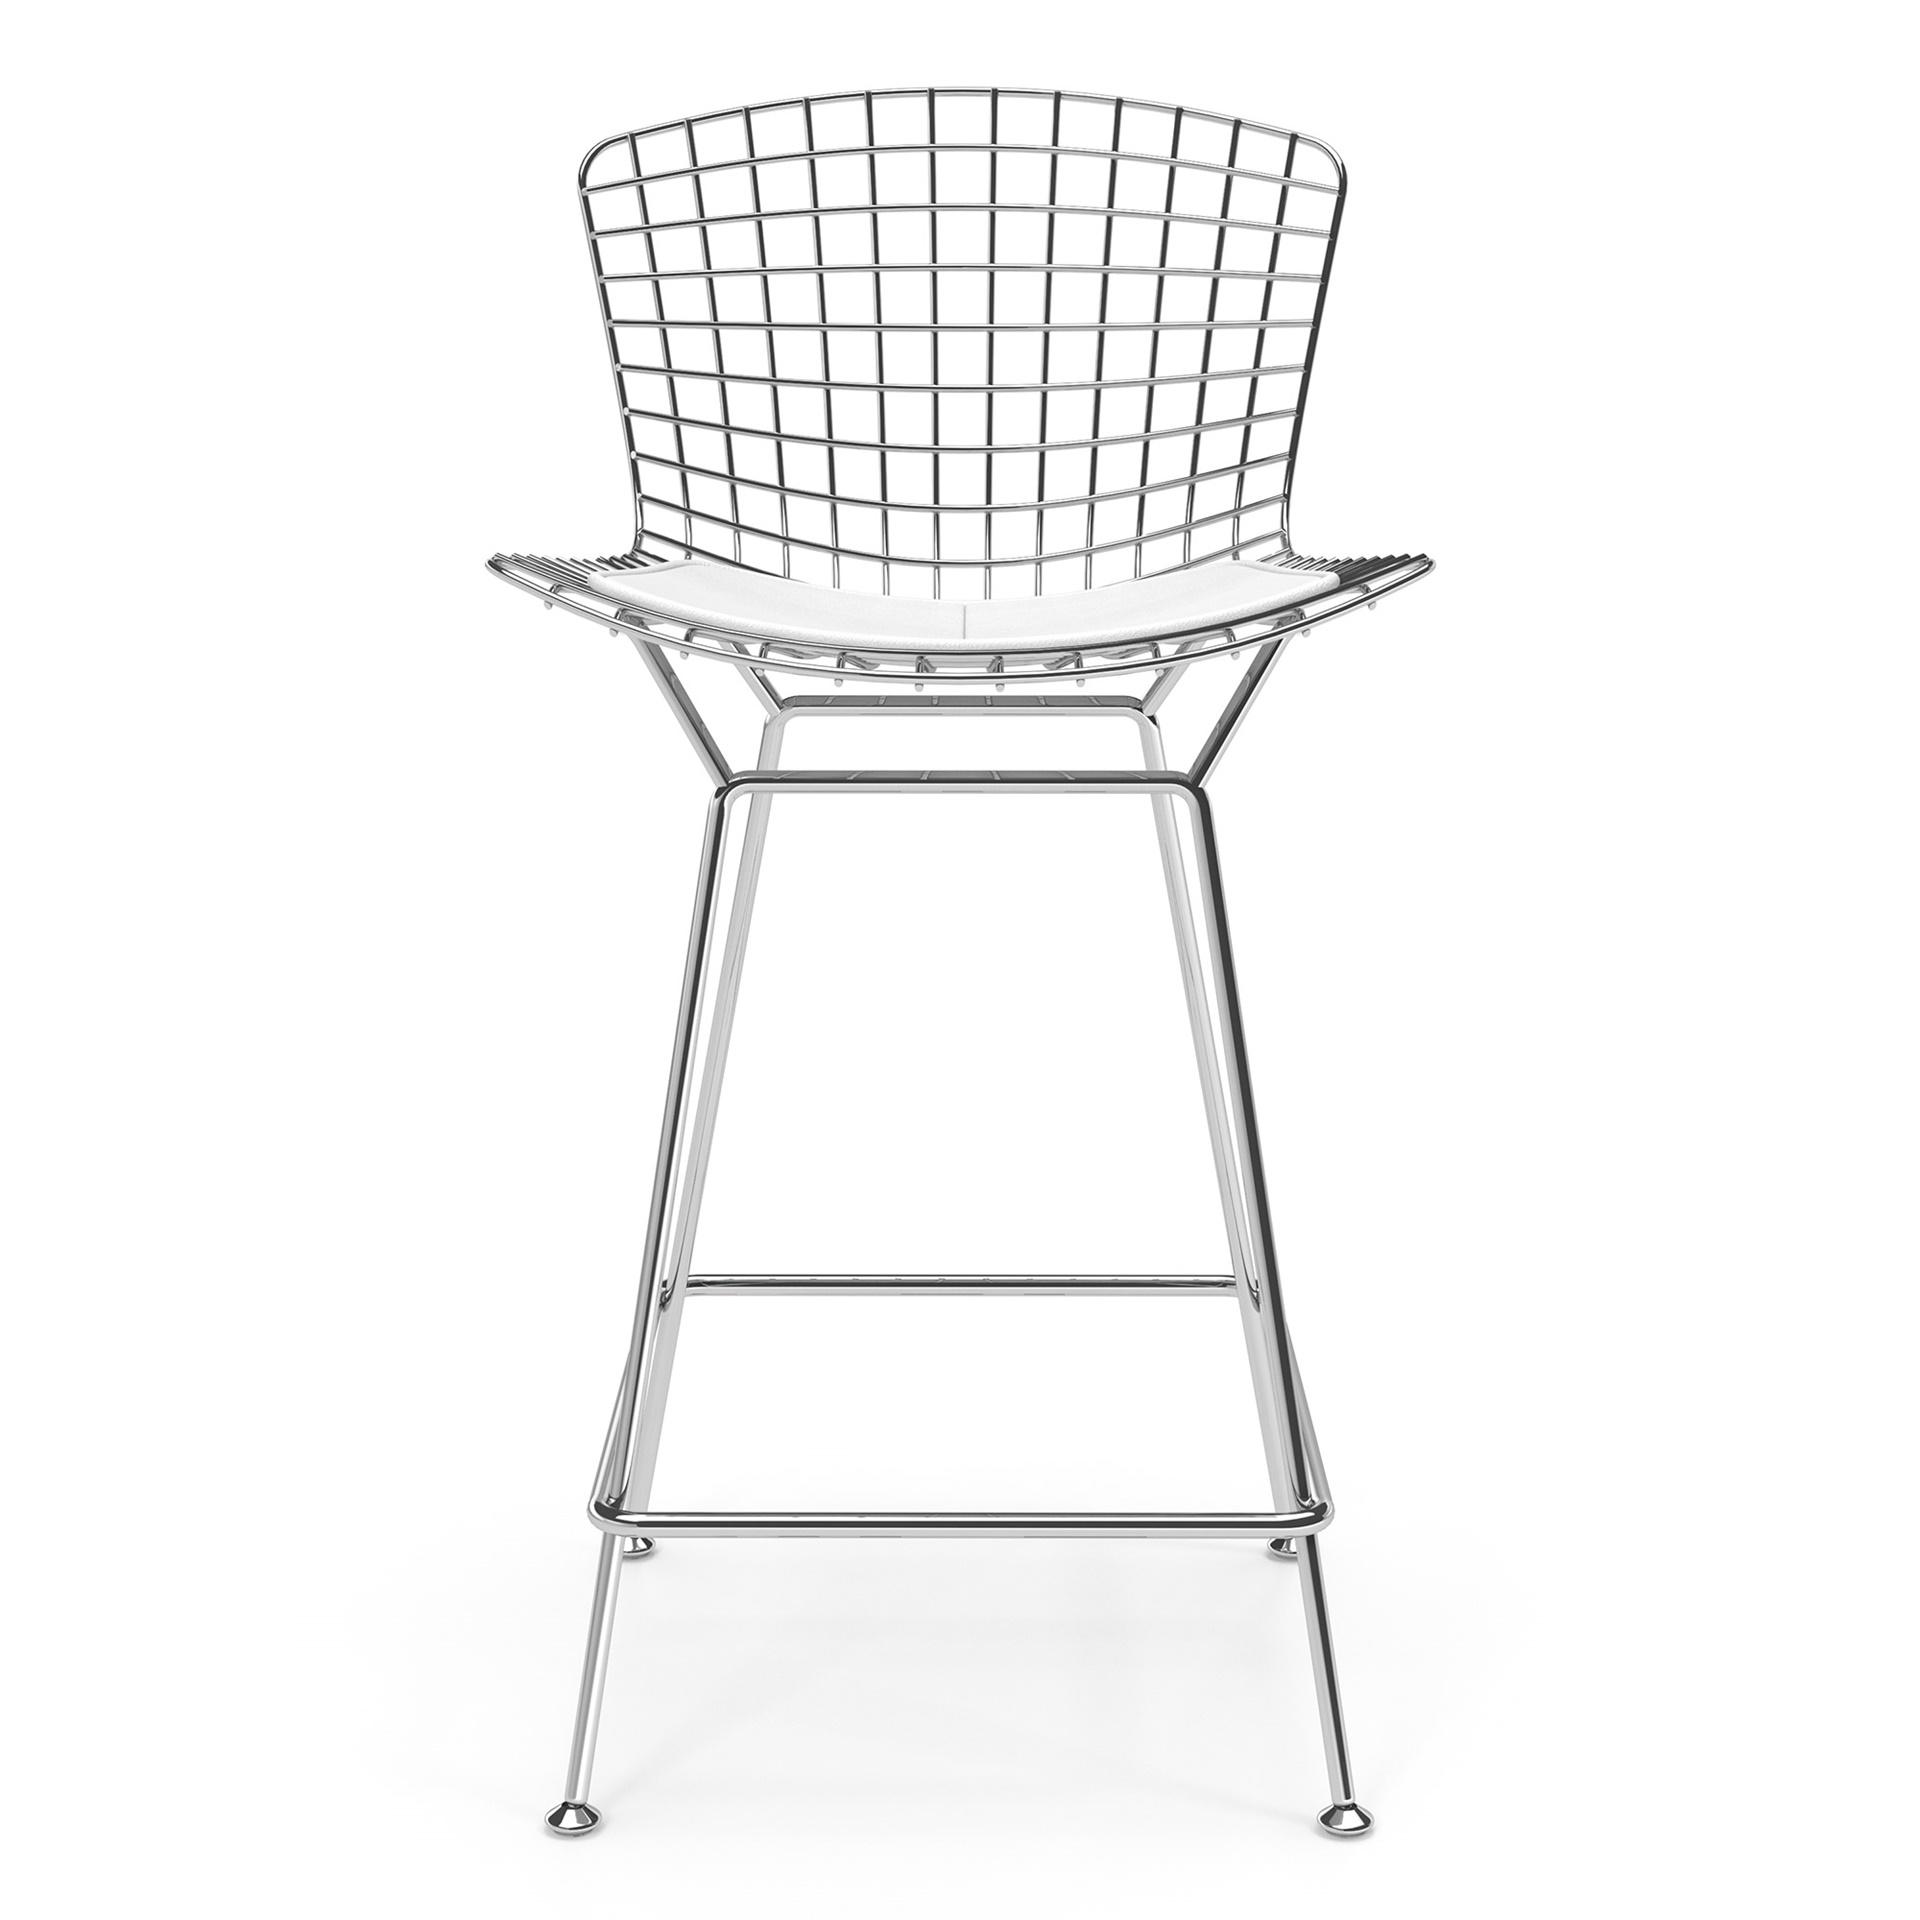 Wondrous Bertoia Counter Stool Beatyapartments Chair Design Images Beatyapartmentscom